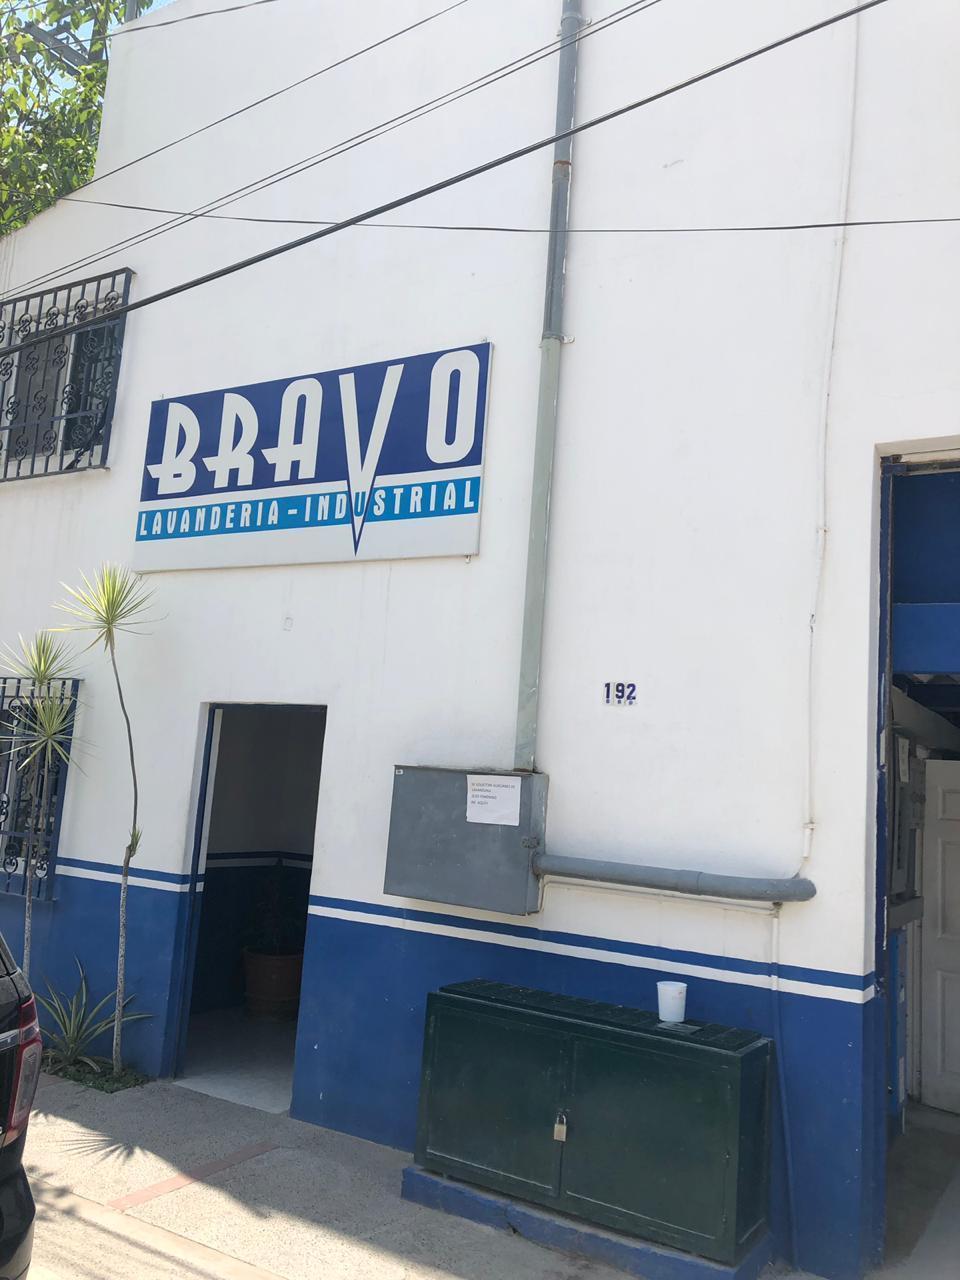 BRAVO LAVANDERIA 192